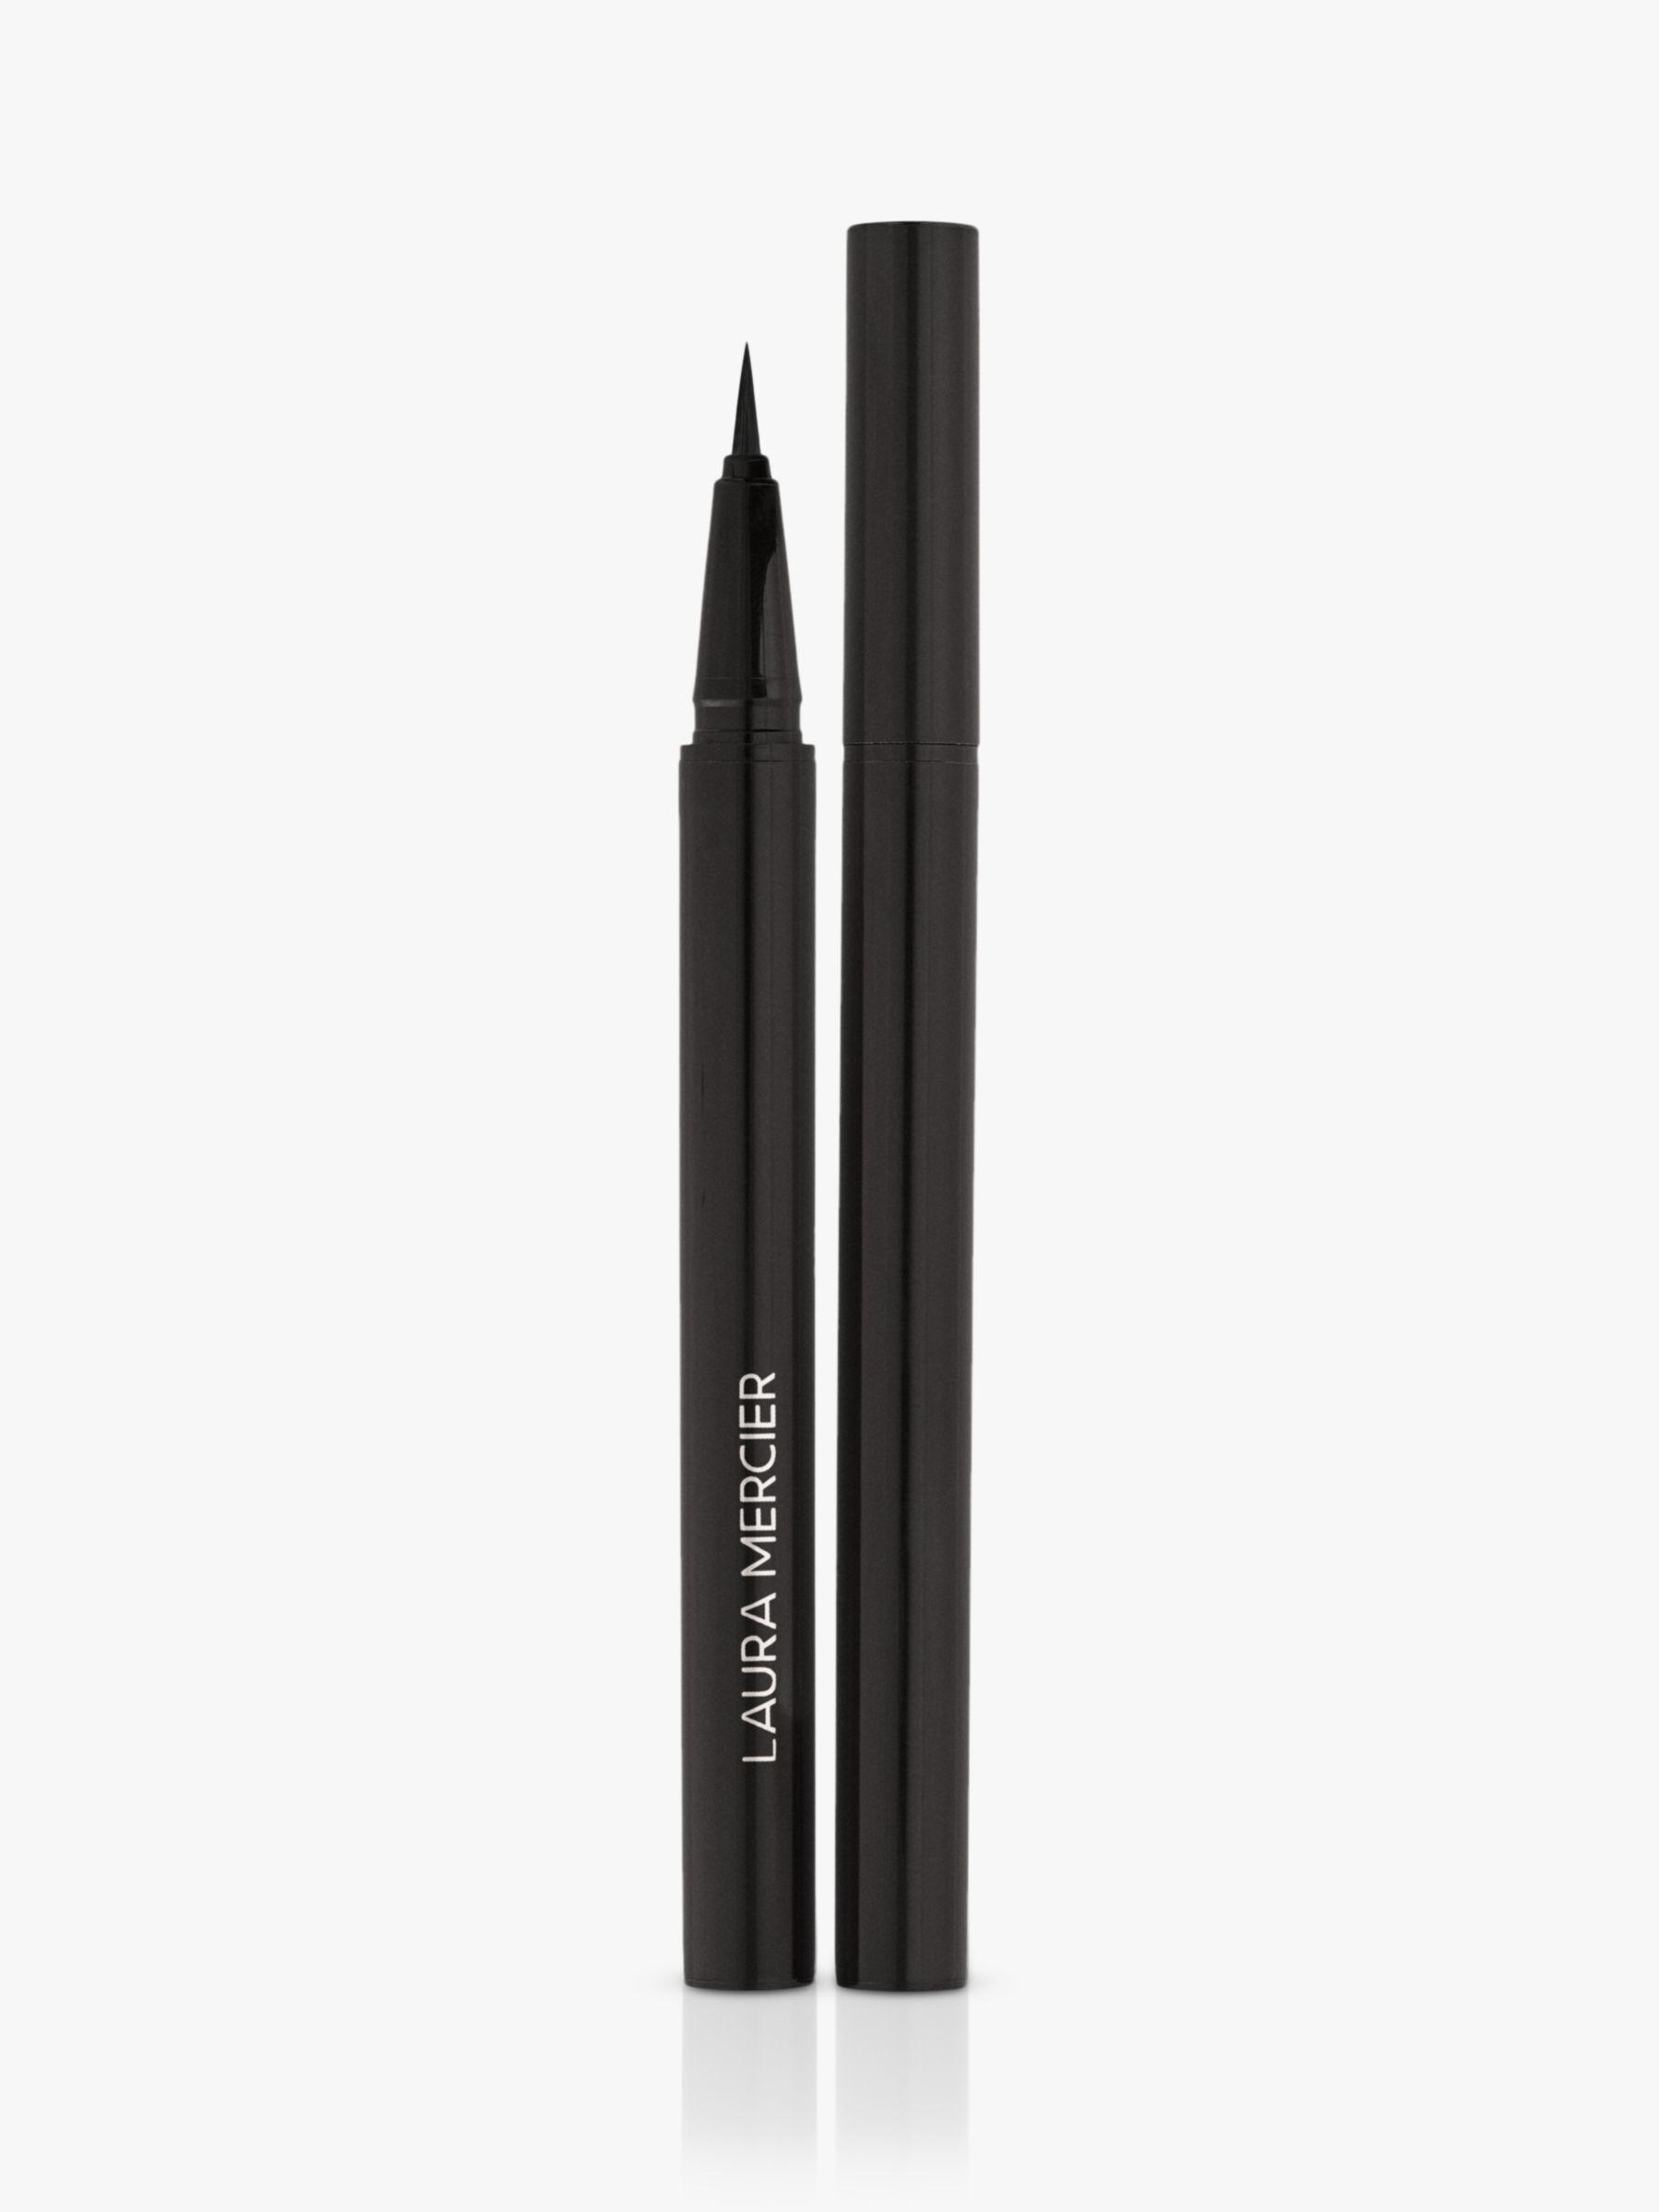 Laura Mercier Laura Mercier Caviar Intense Ink Waterproof Liquid Eyeliner, Black